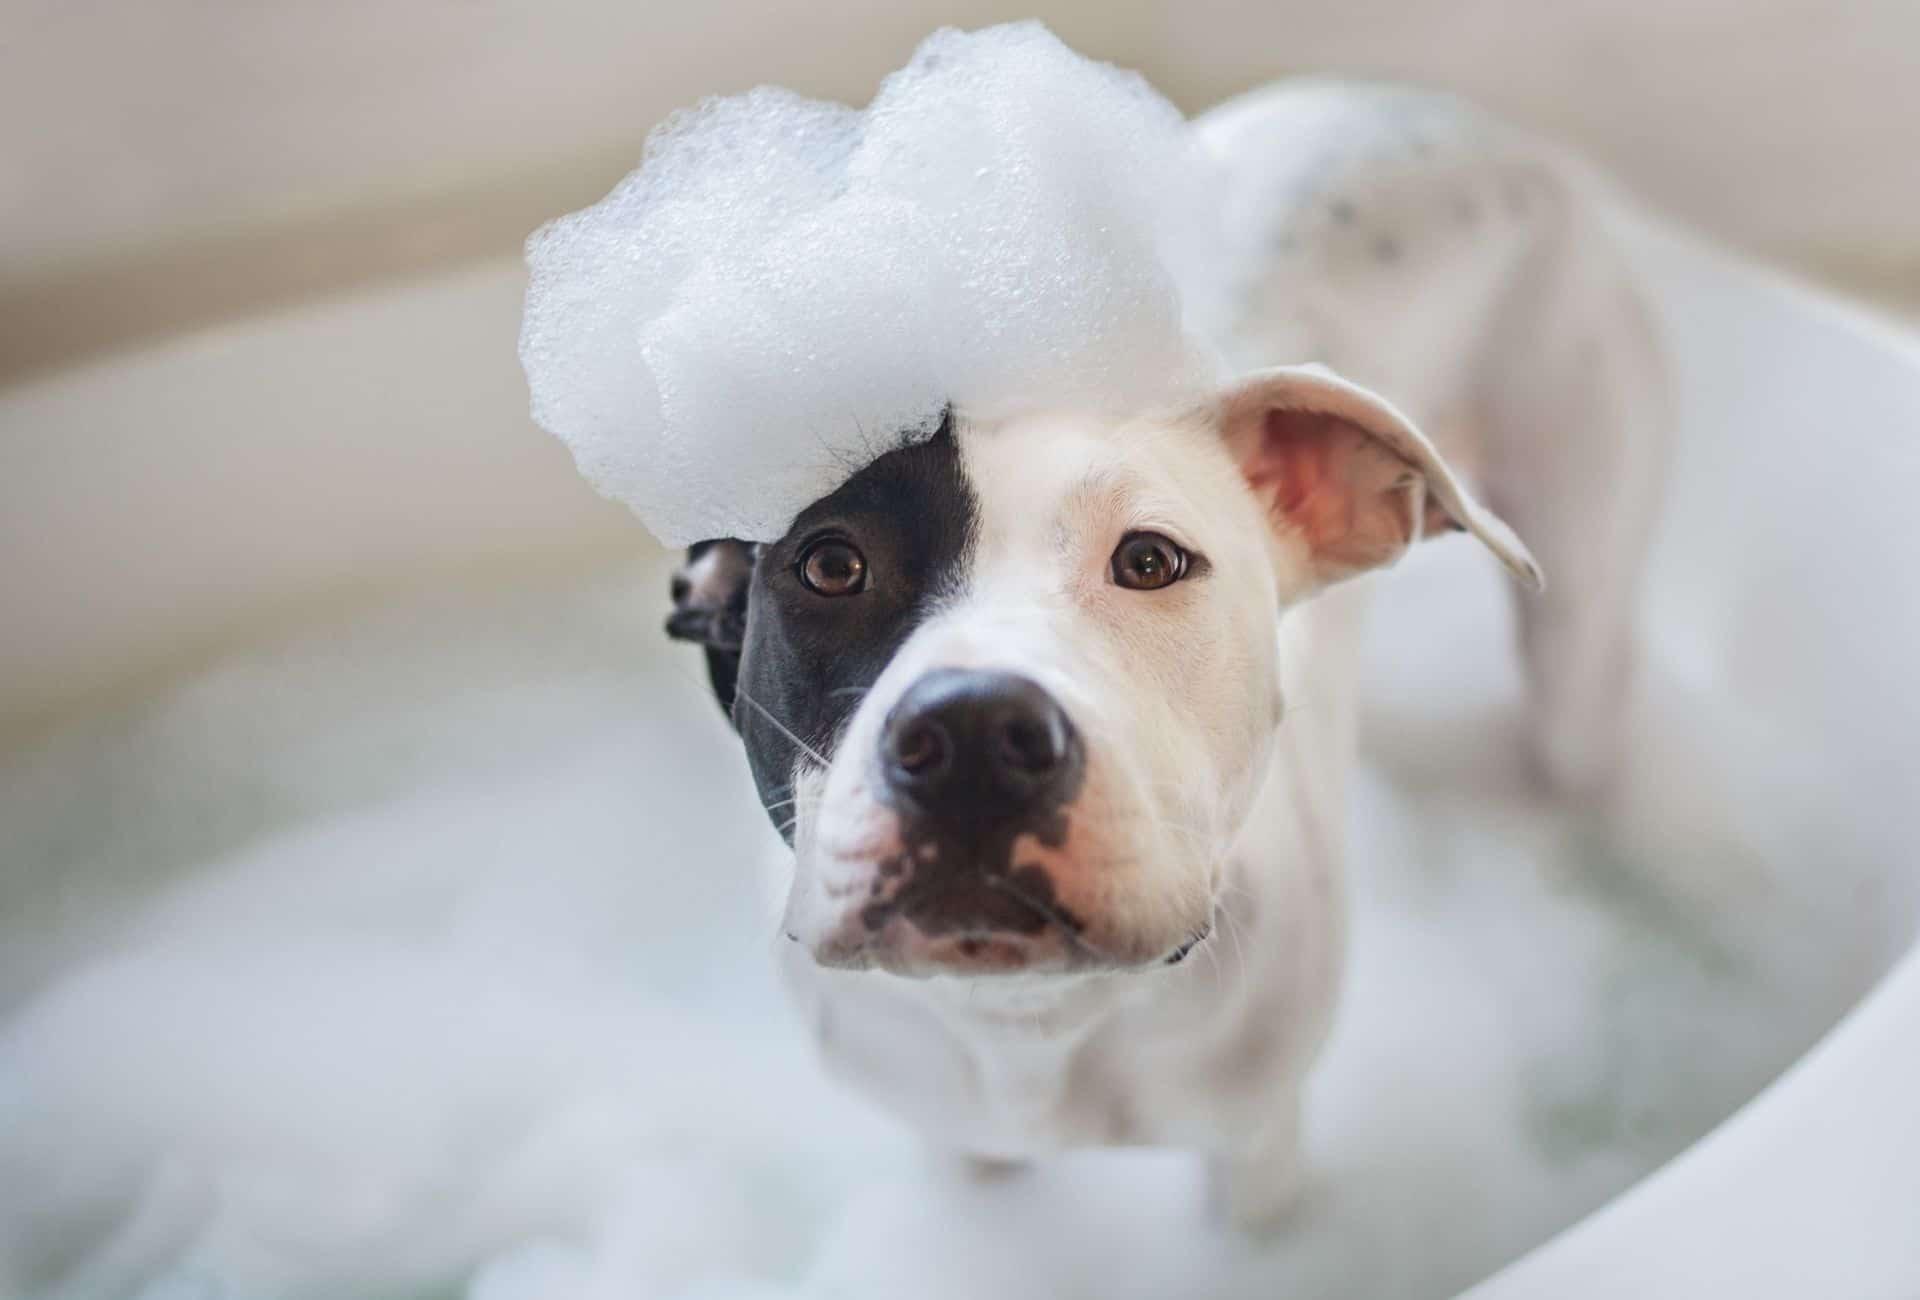 Pitbull in bathtub